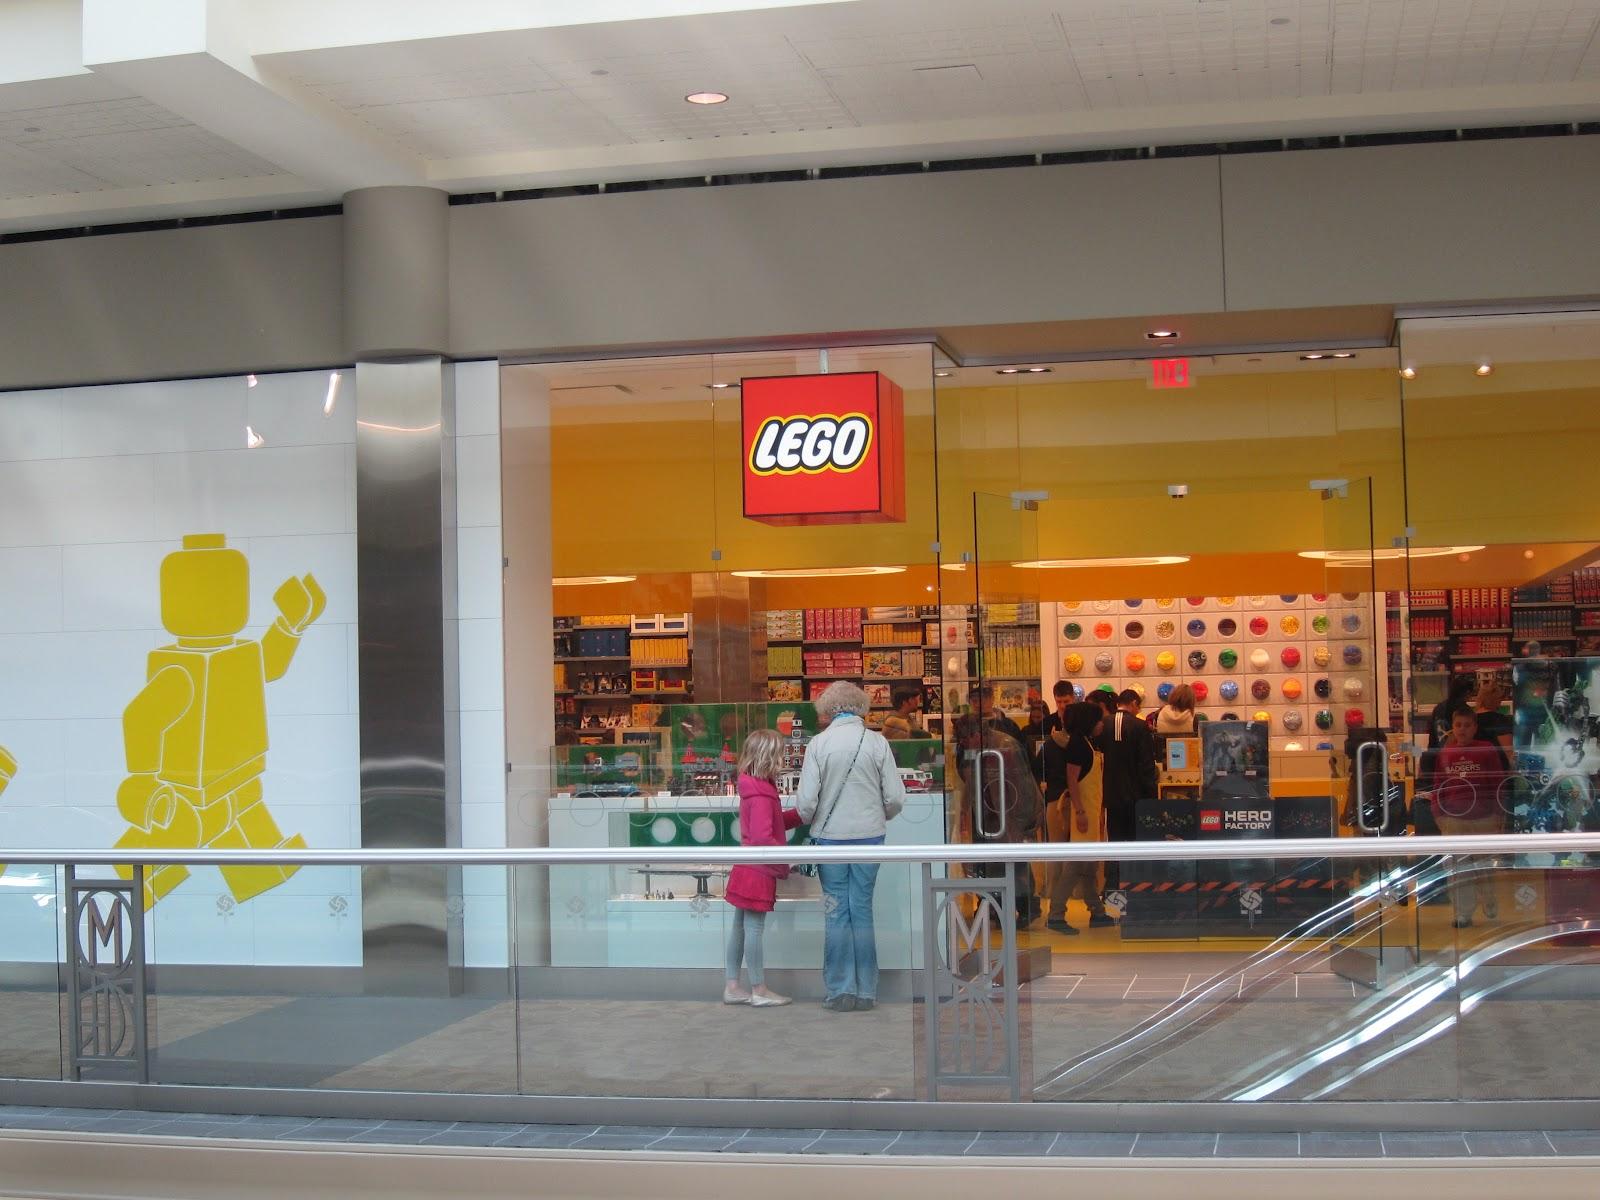 in Milwaukee Buried Store LEGO (Wauwatosa) now Bricks: open